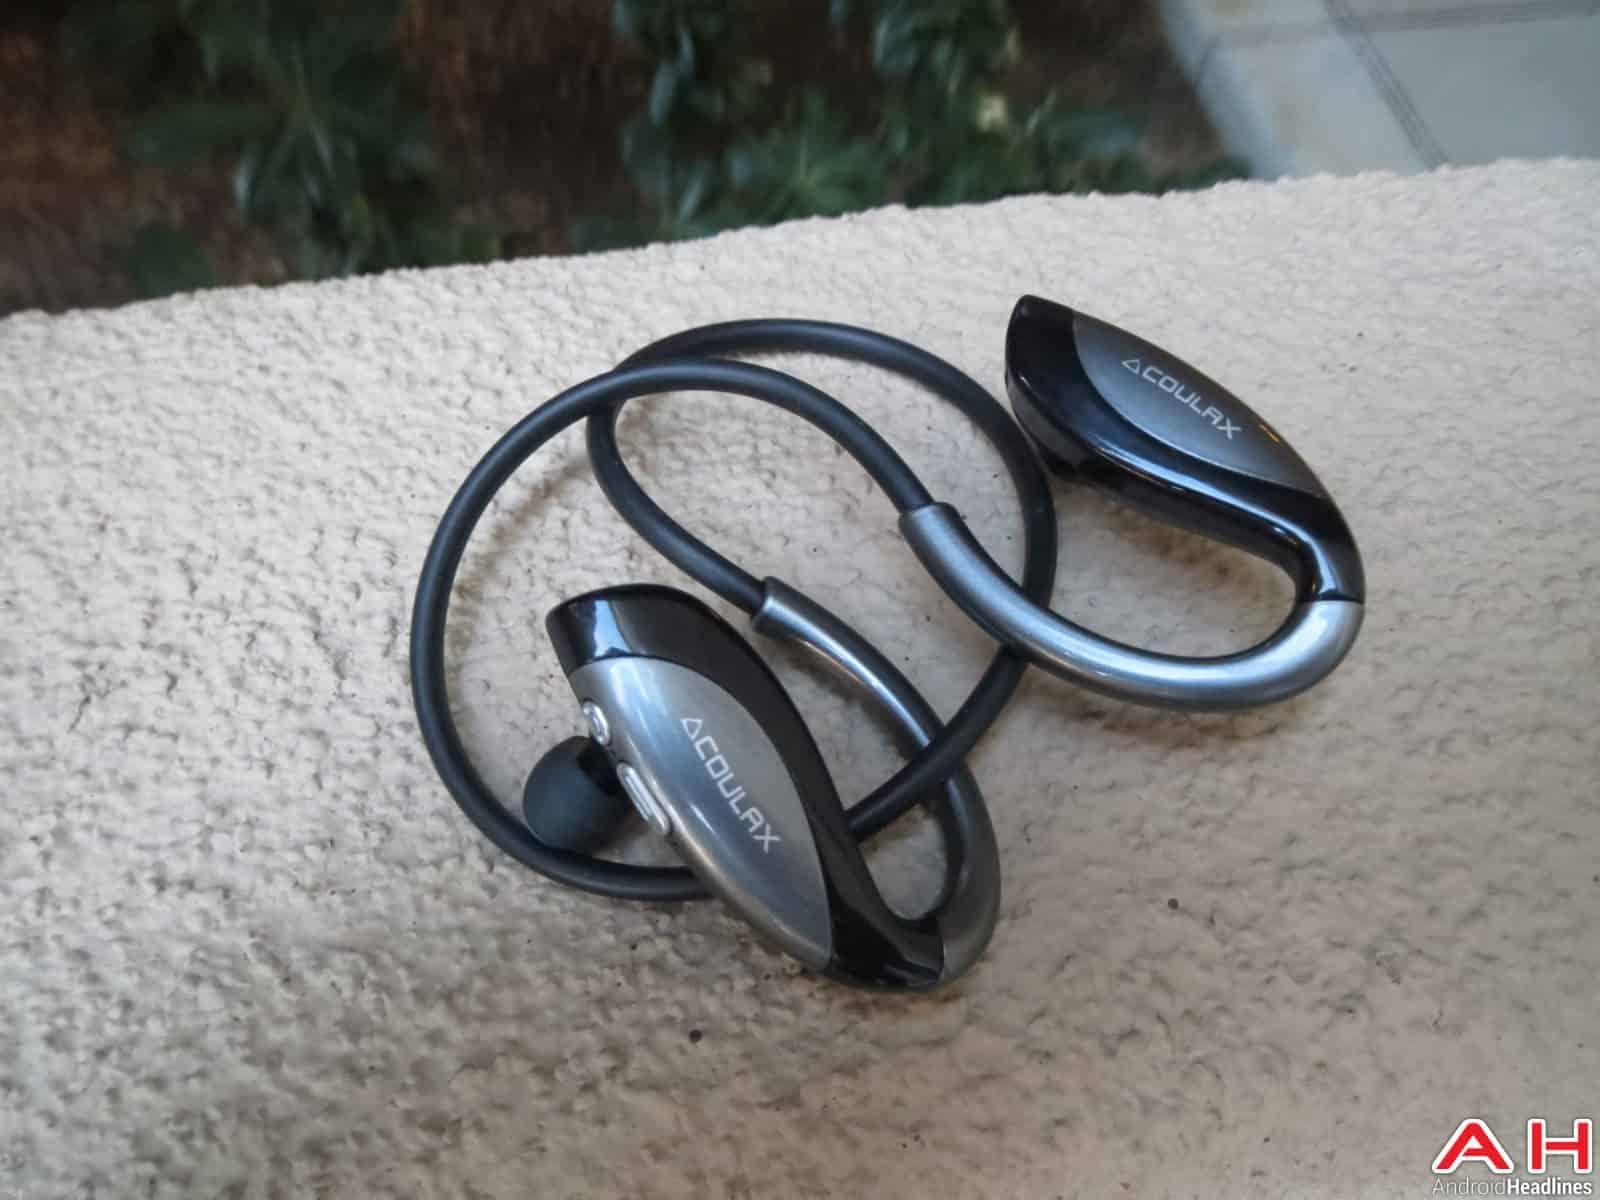 Coulax Bluetooth Sports earphones add AH-4